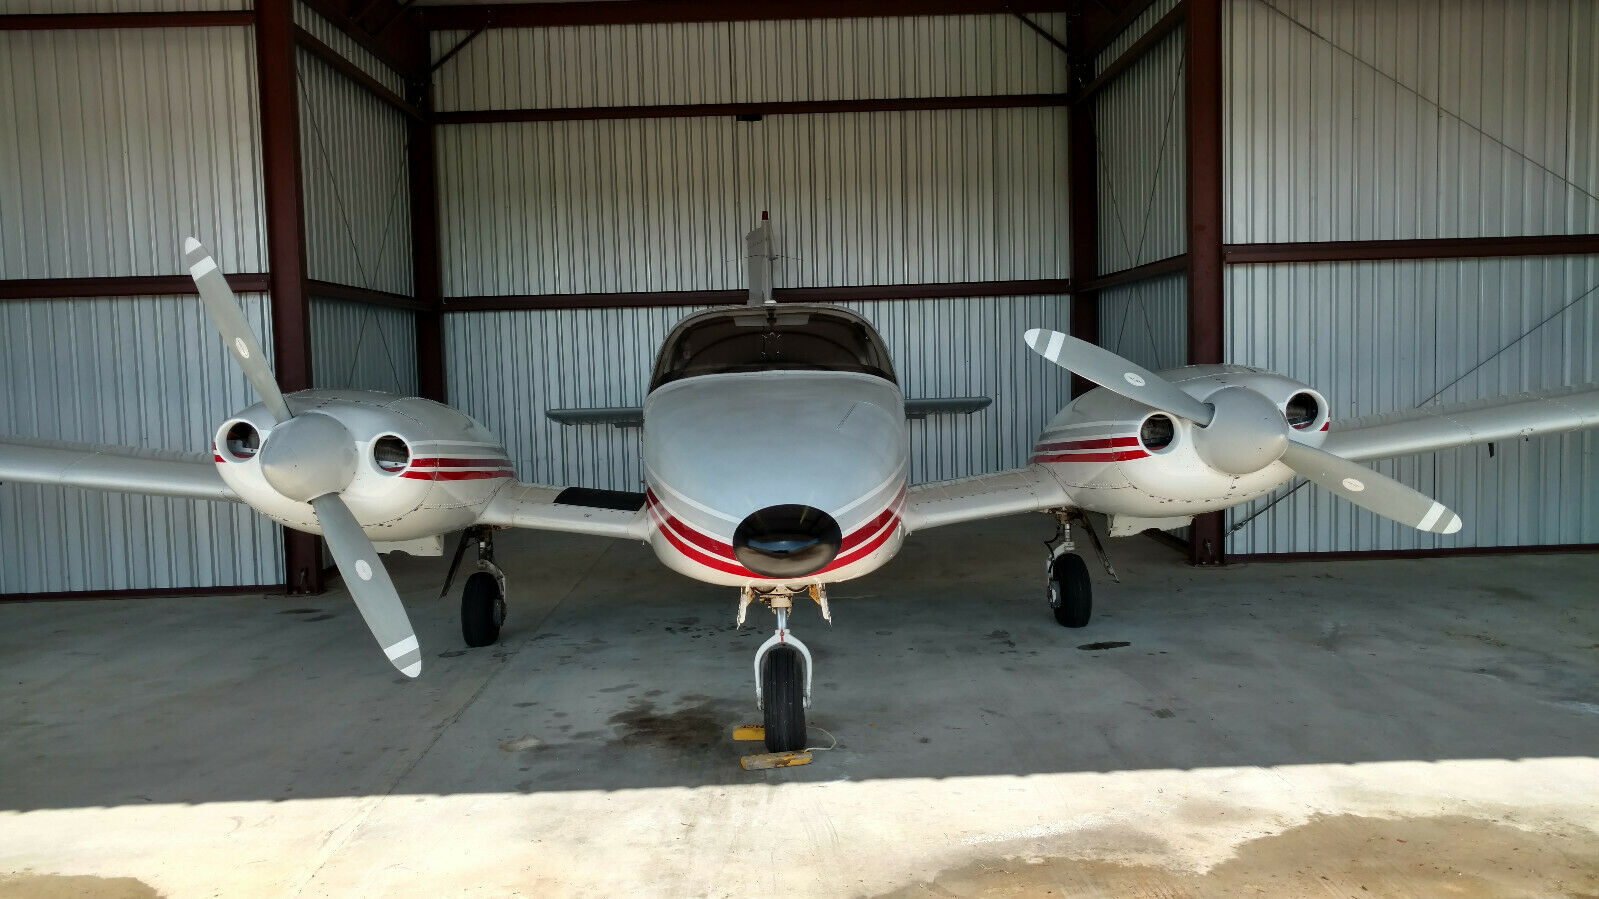 great shape 1975 Piper Seneca II PA 34 200T aircraft for sale